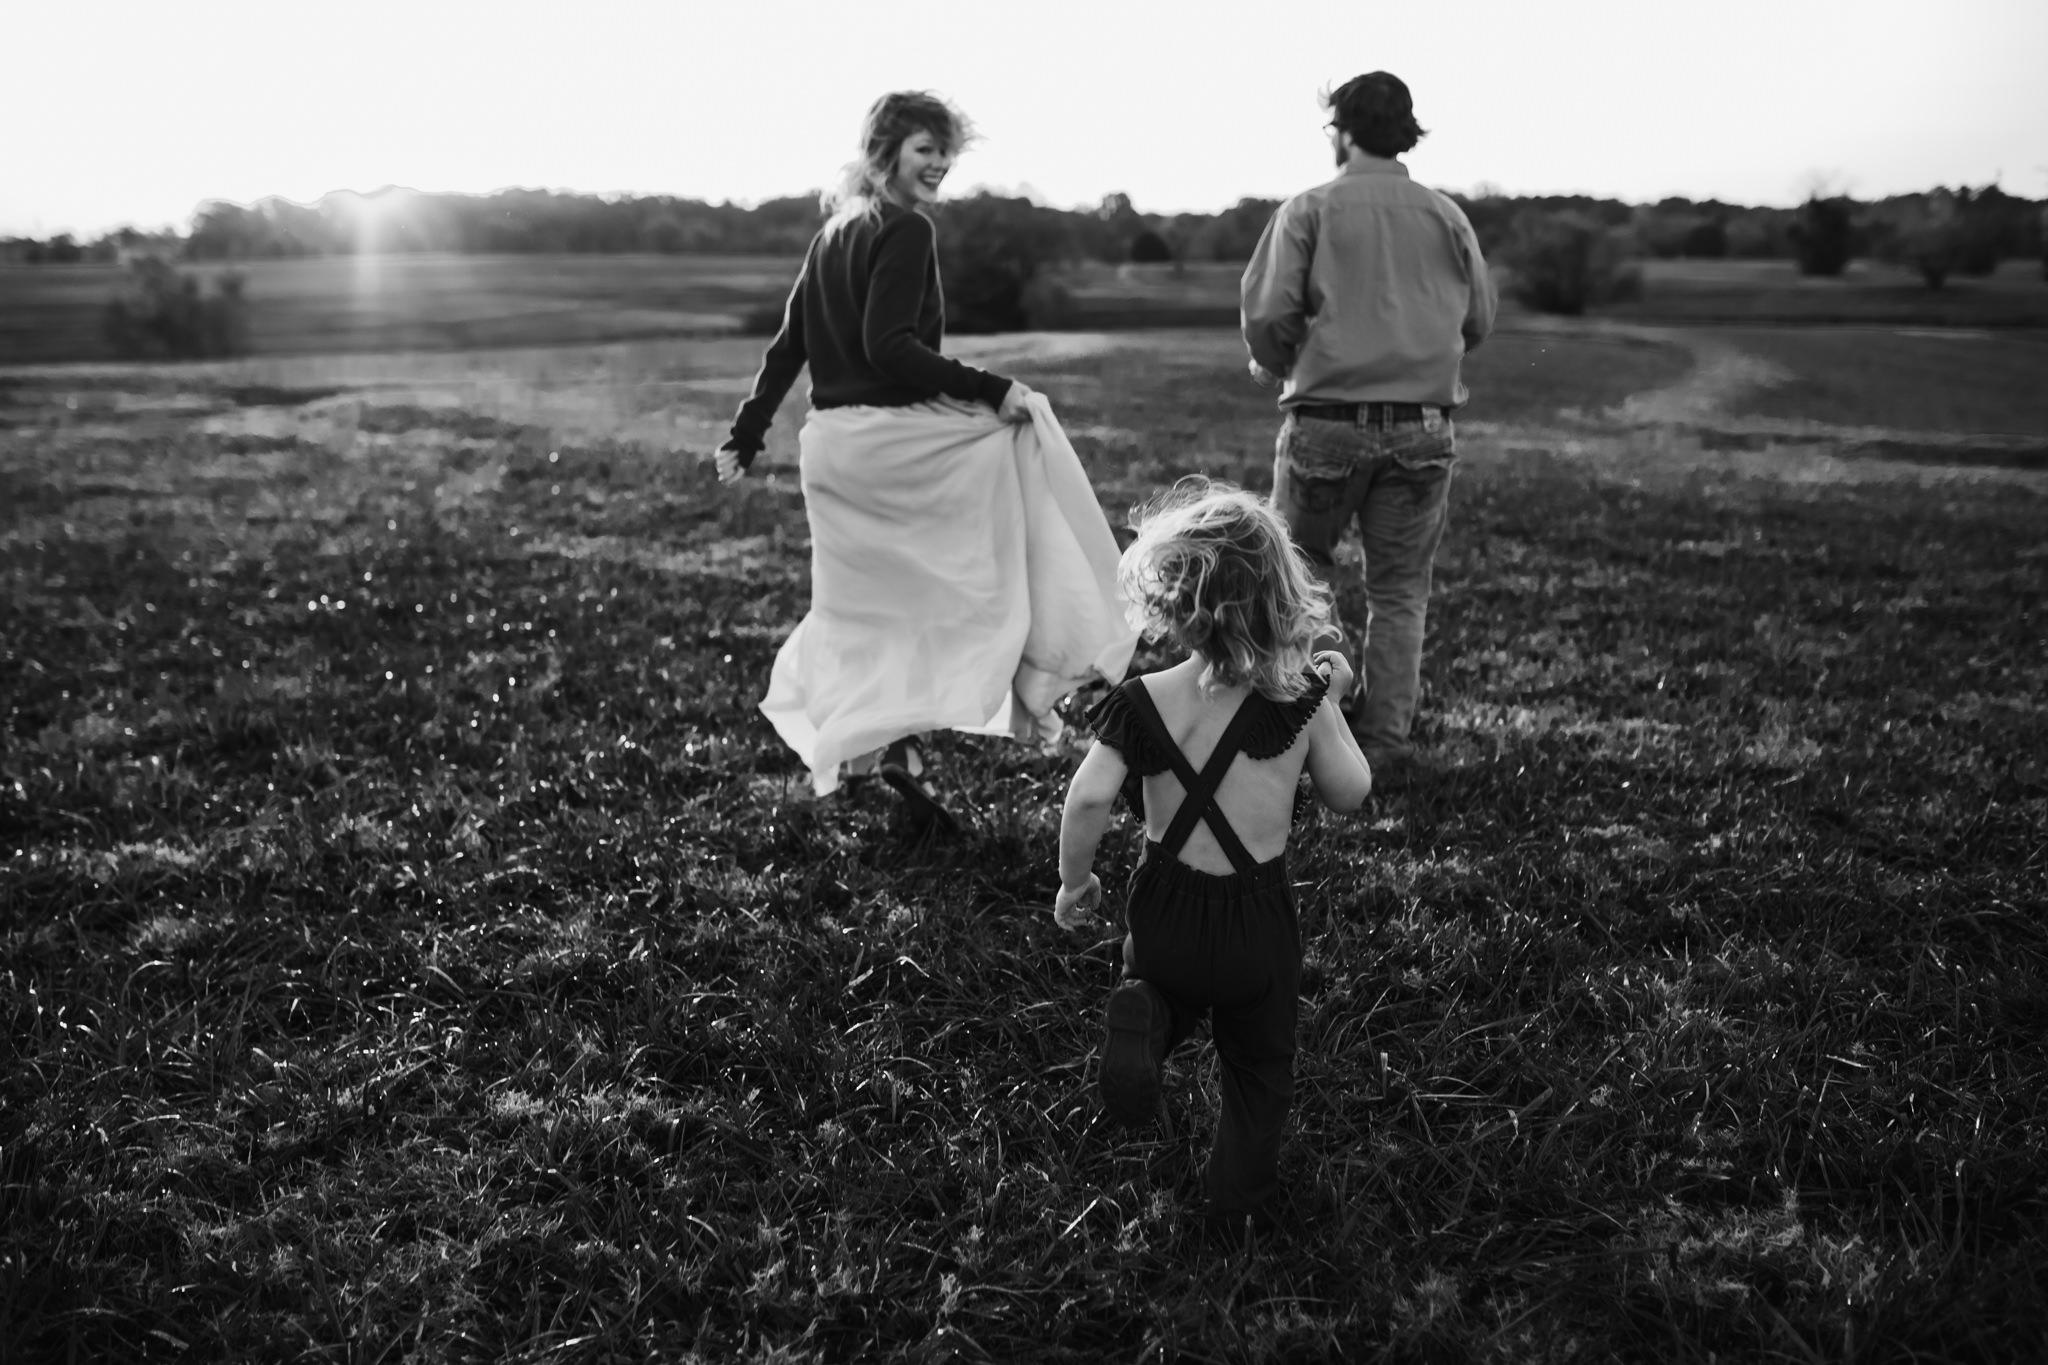 cassie-cook-photography-memphis-family-photographer-lifestyle-family-photographer-sunrise-gray-family-15.jpg